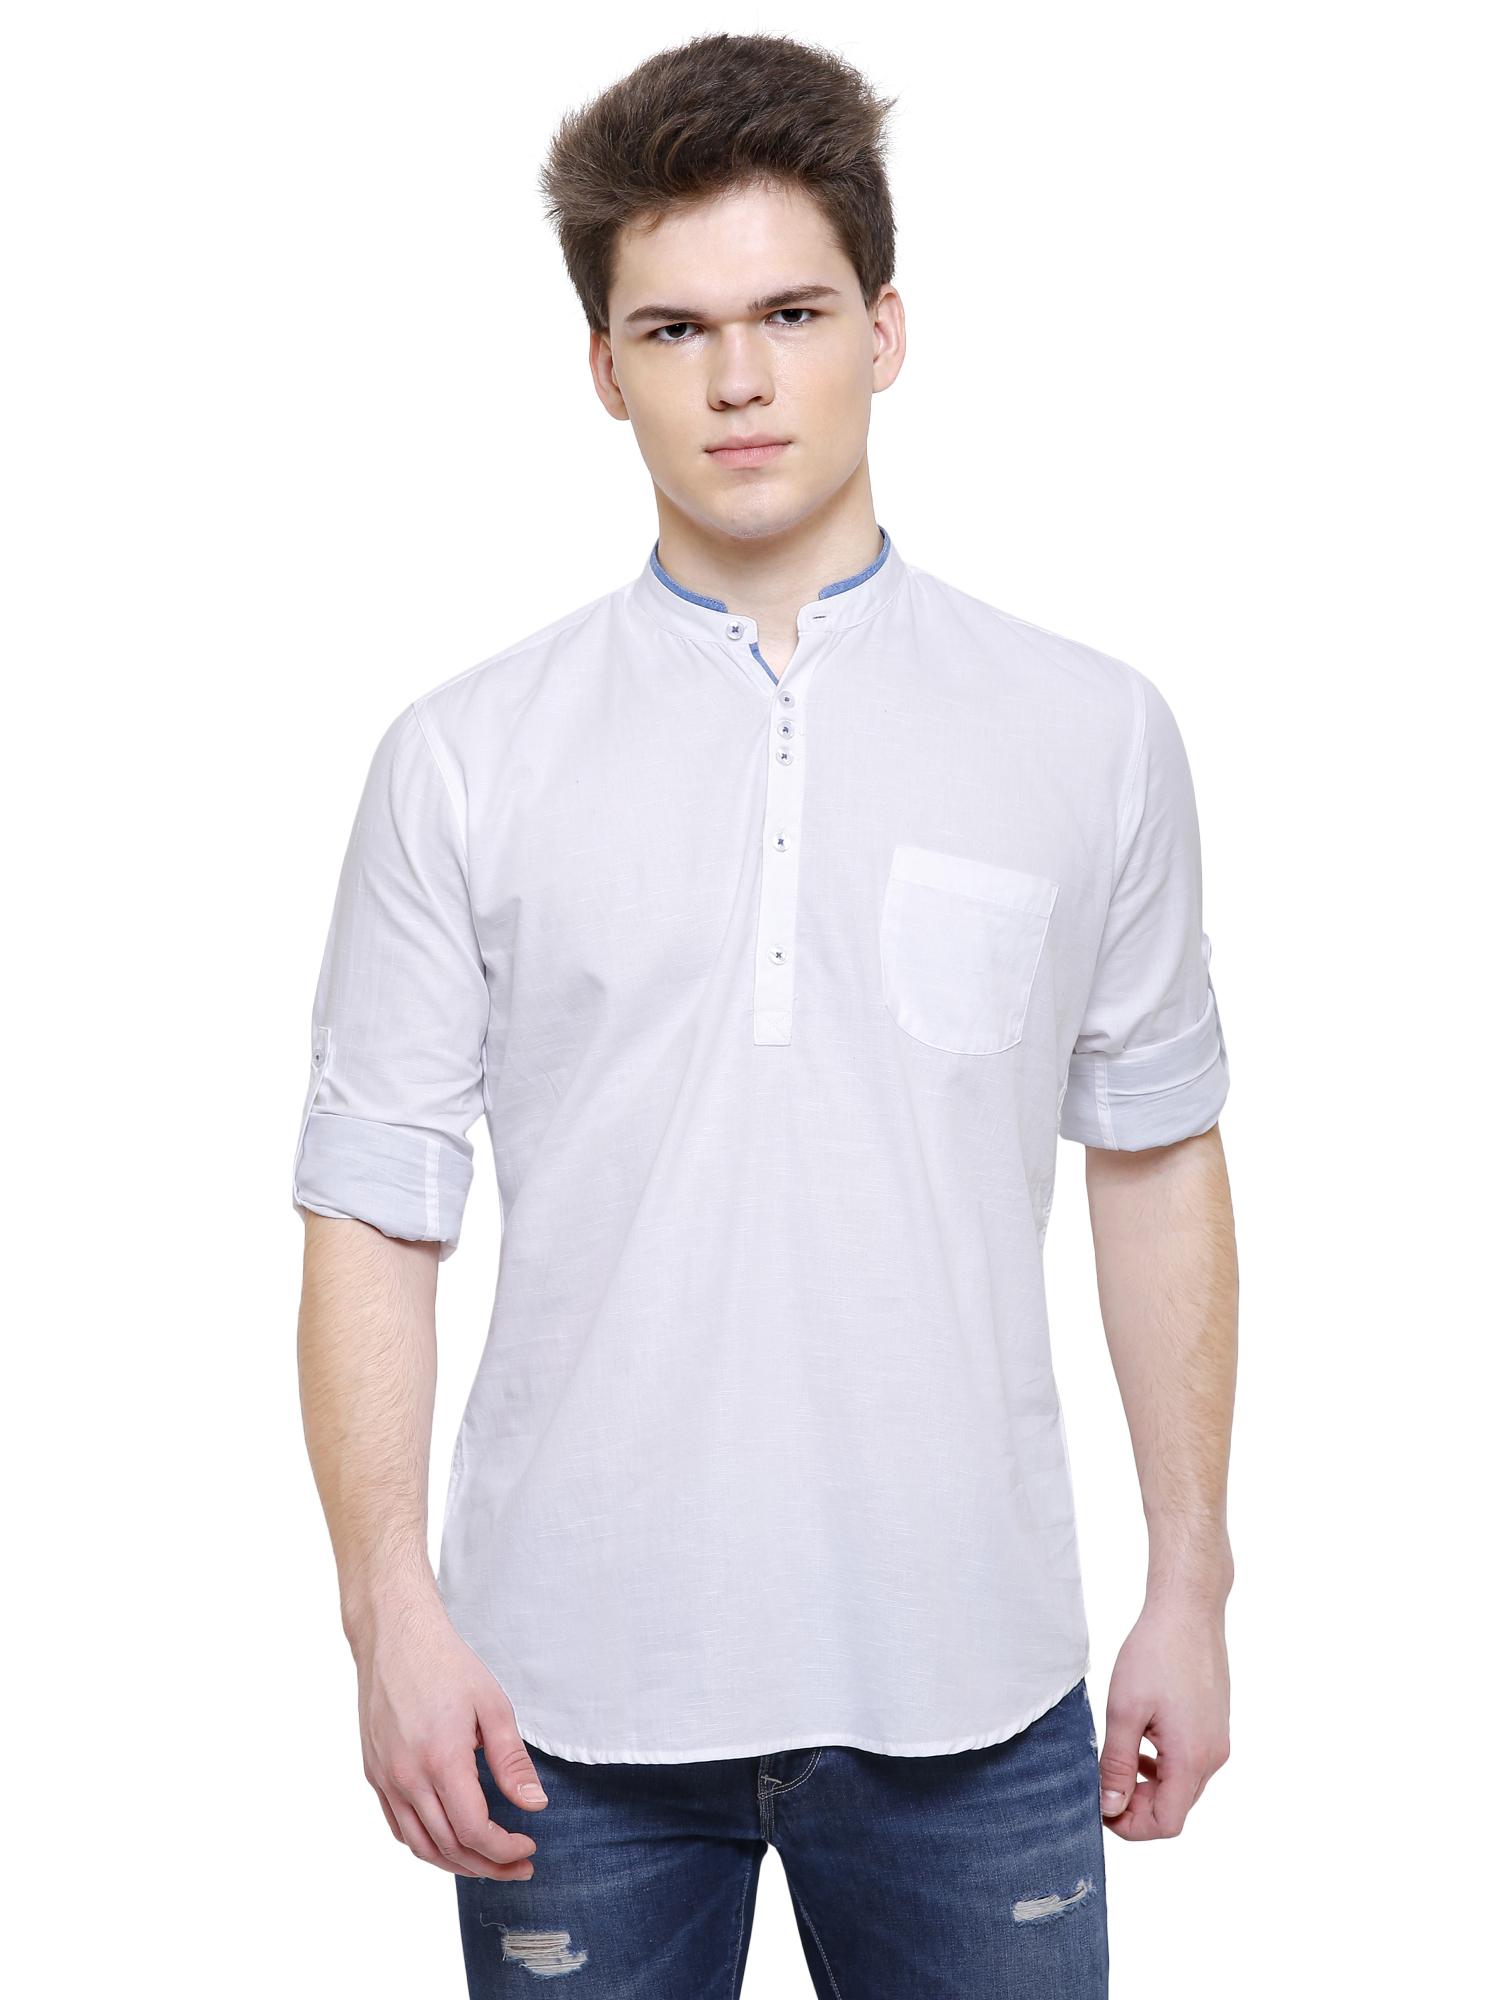 Kuons Avenue Men's White Linen Cotton Short Kurta- KACLFS1317WH